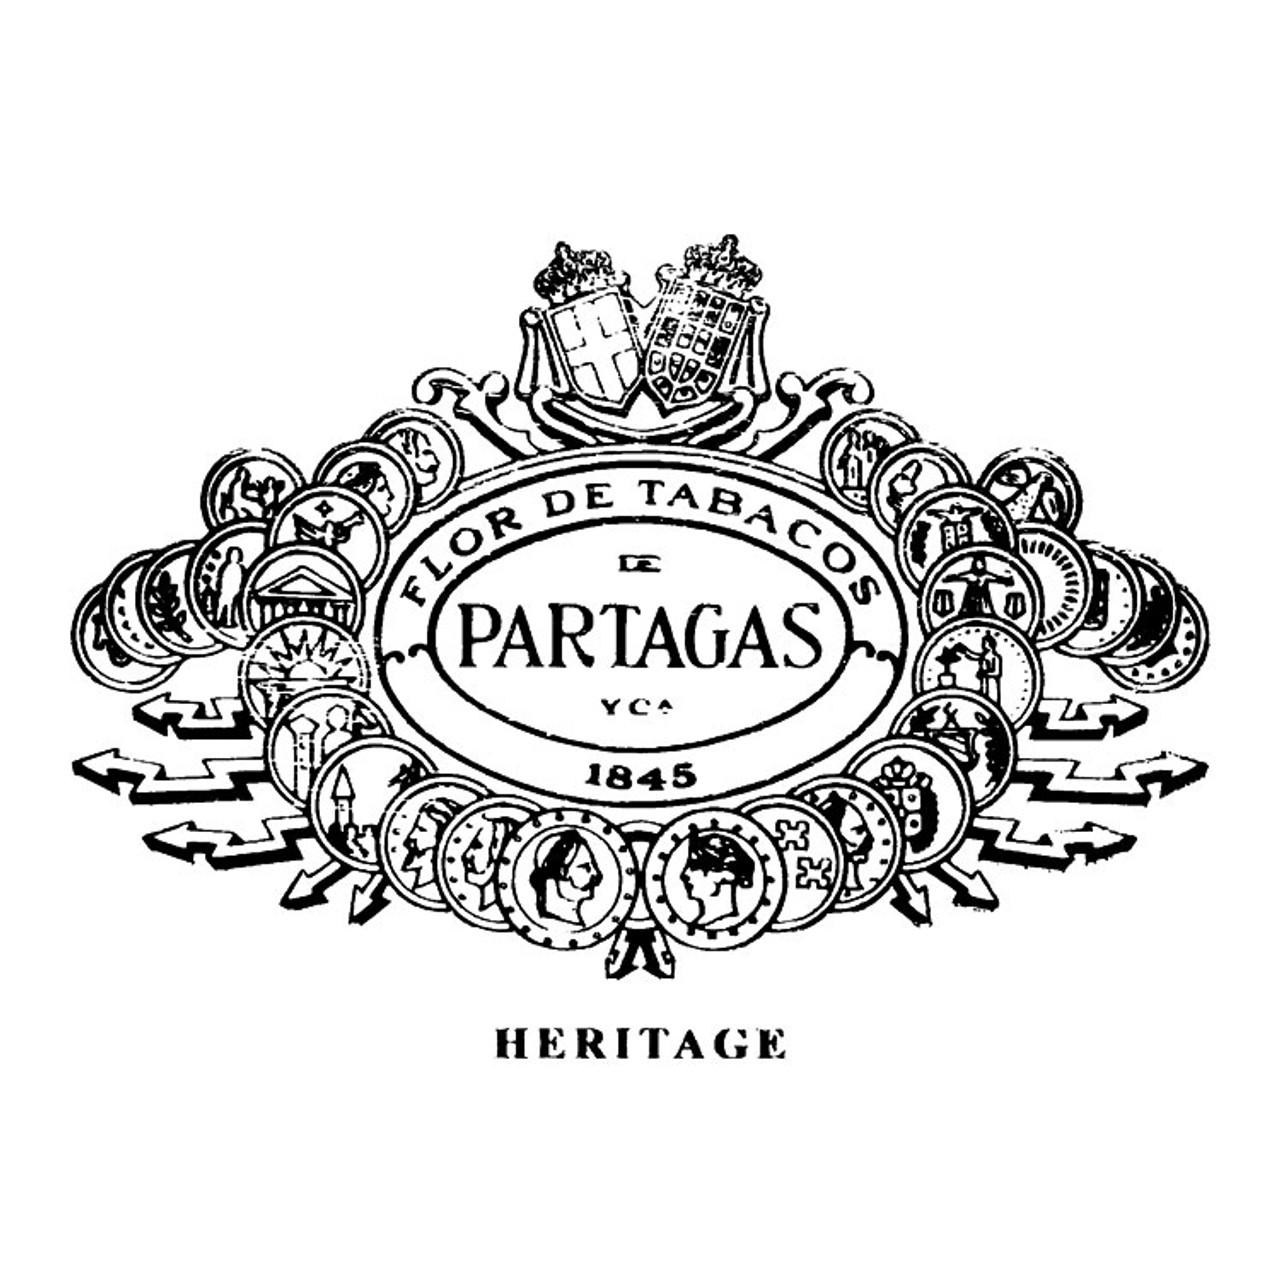 Partagas Heritage Robusto Cigars - 5.5 x 52 (Box of 20)